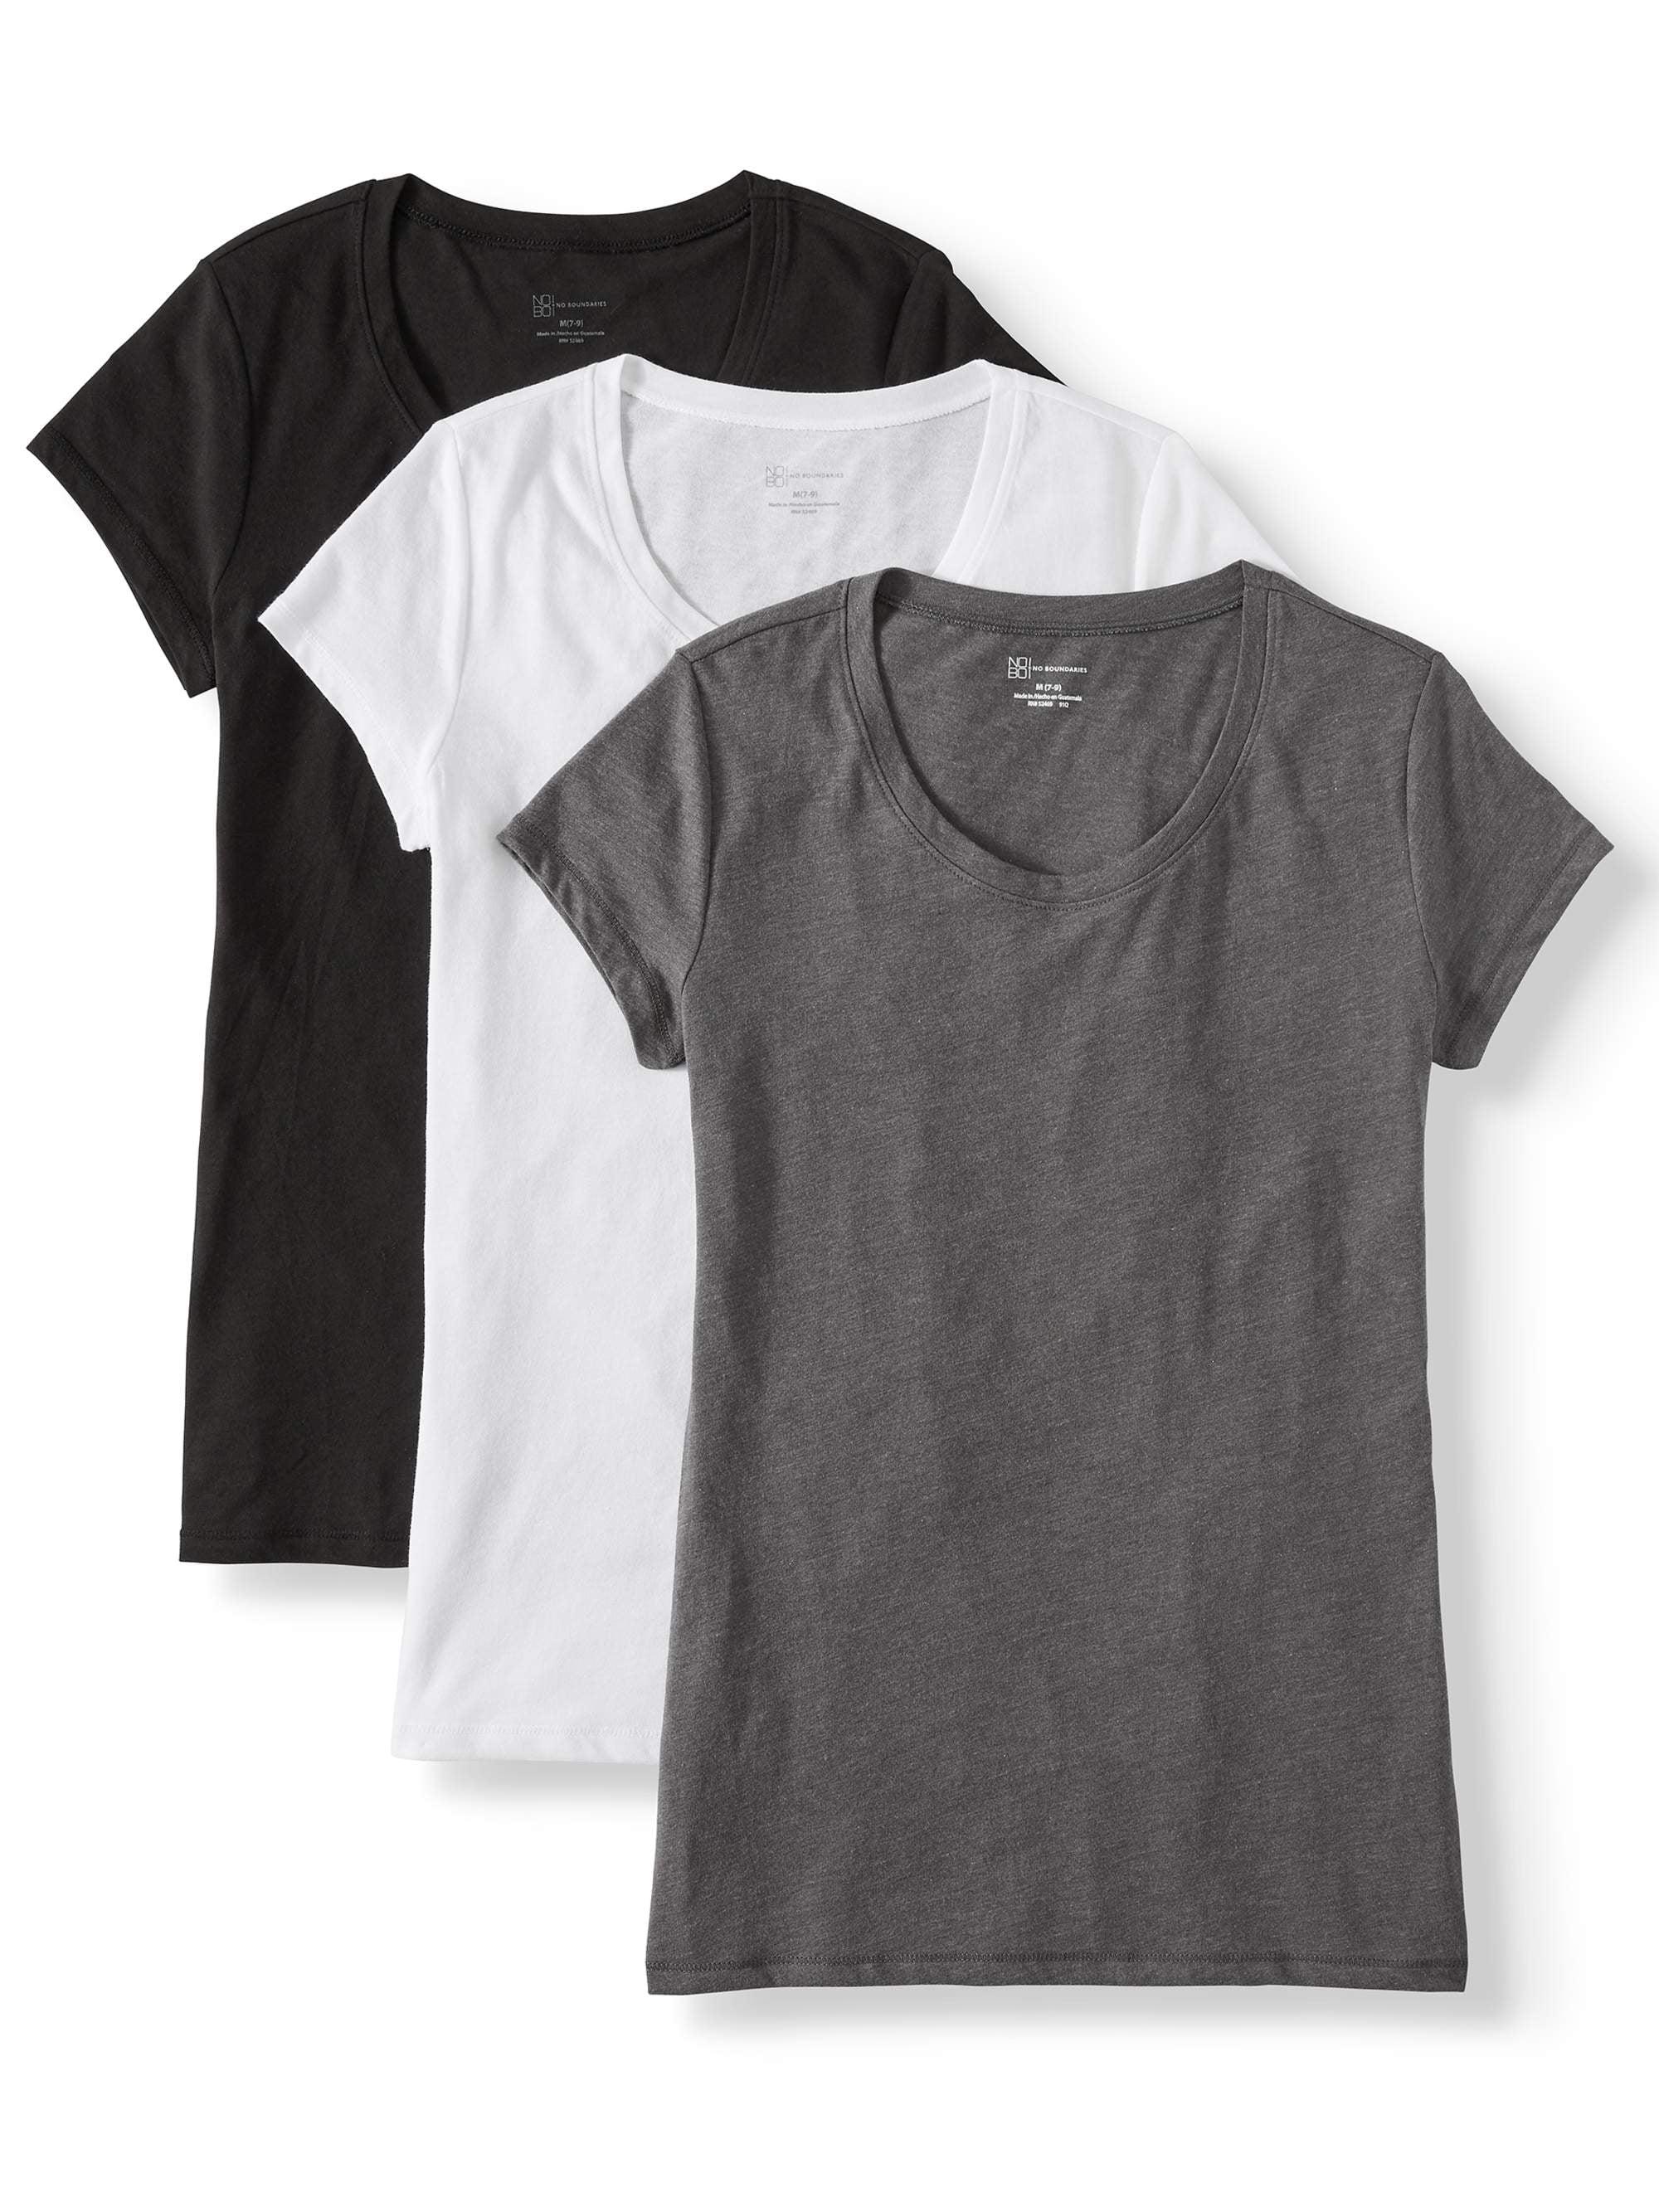 T-Shirts New All The President/'s Men Retro Vintage Transfer Juniors Tee Shirt